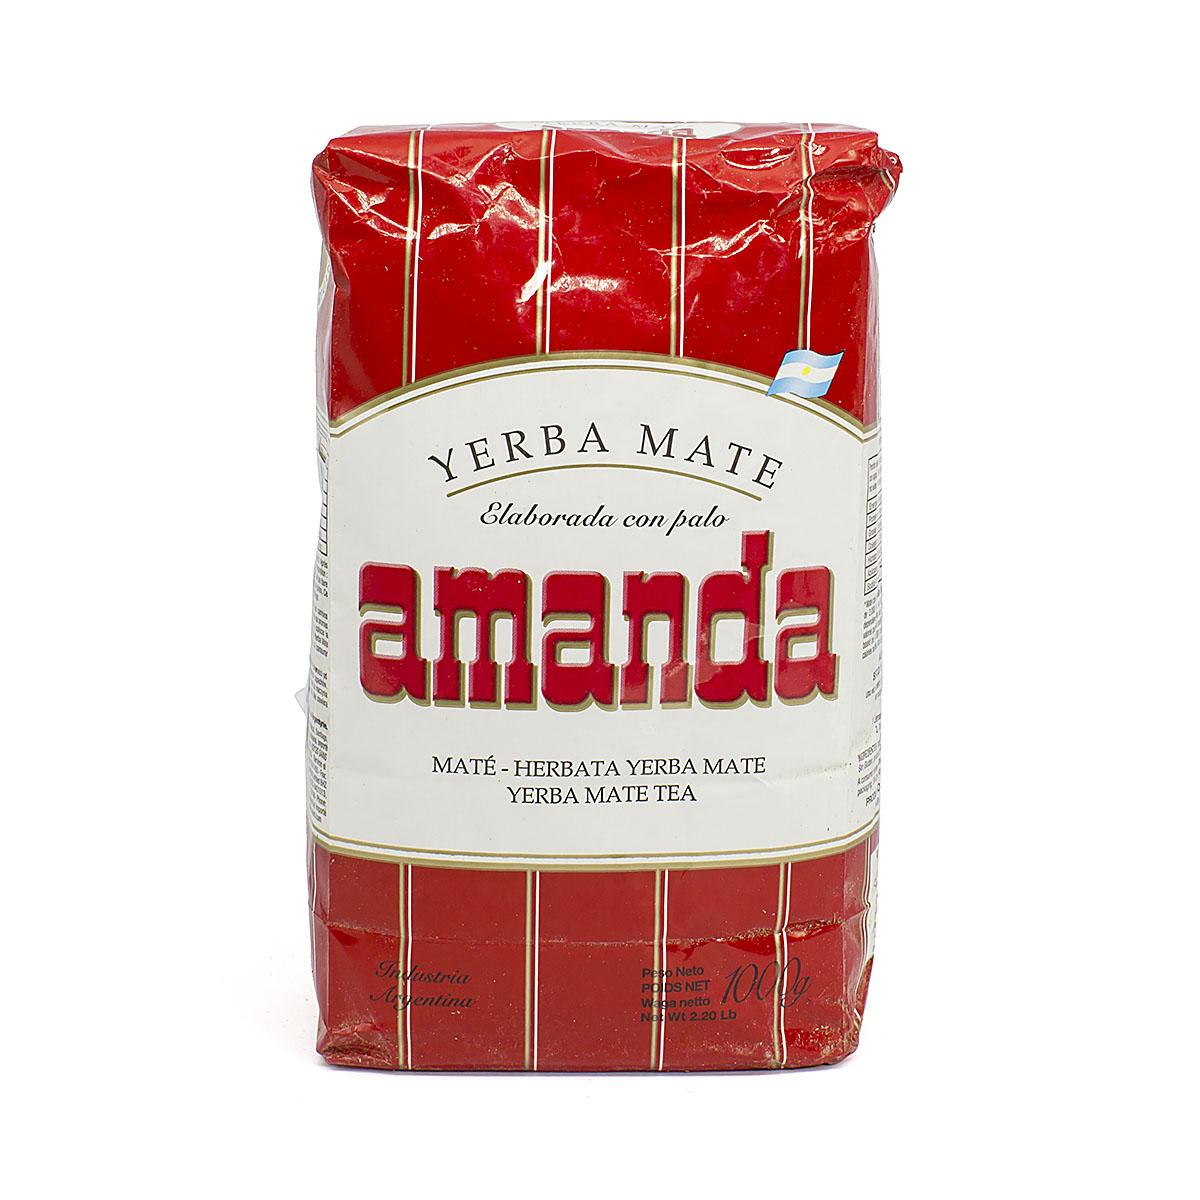 Мате Amanda Tradicional, 1000 г мате amanda tradicional pressed 250 г